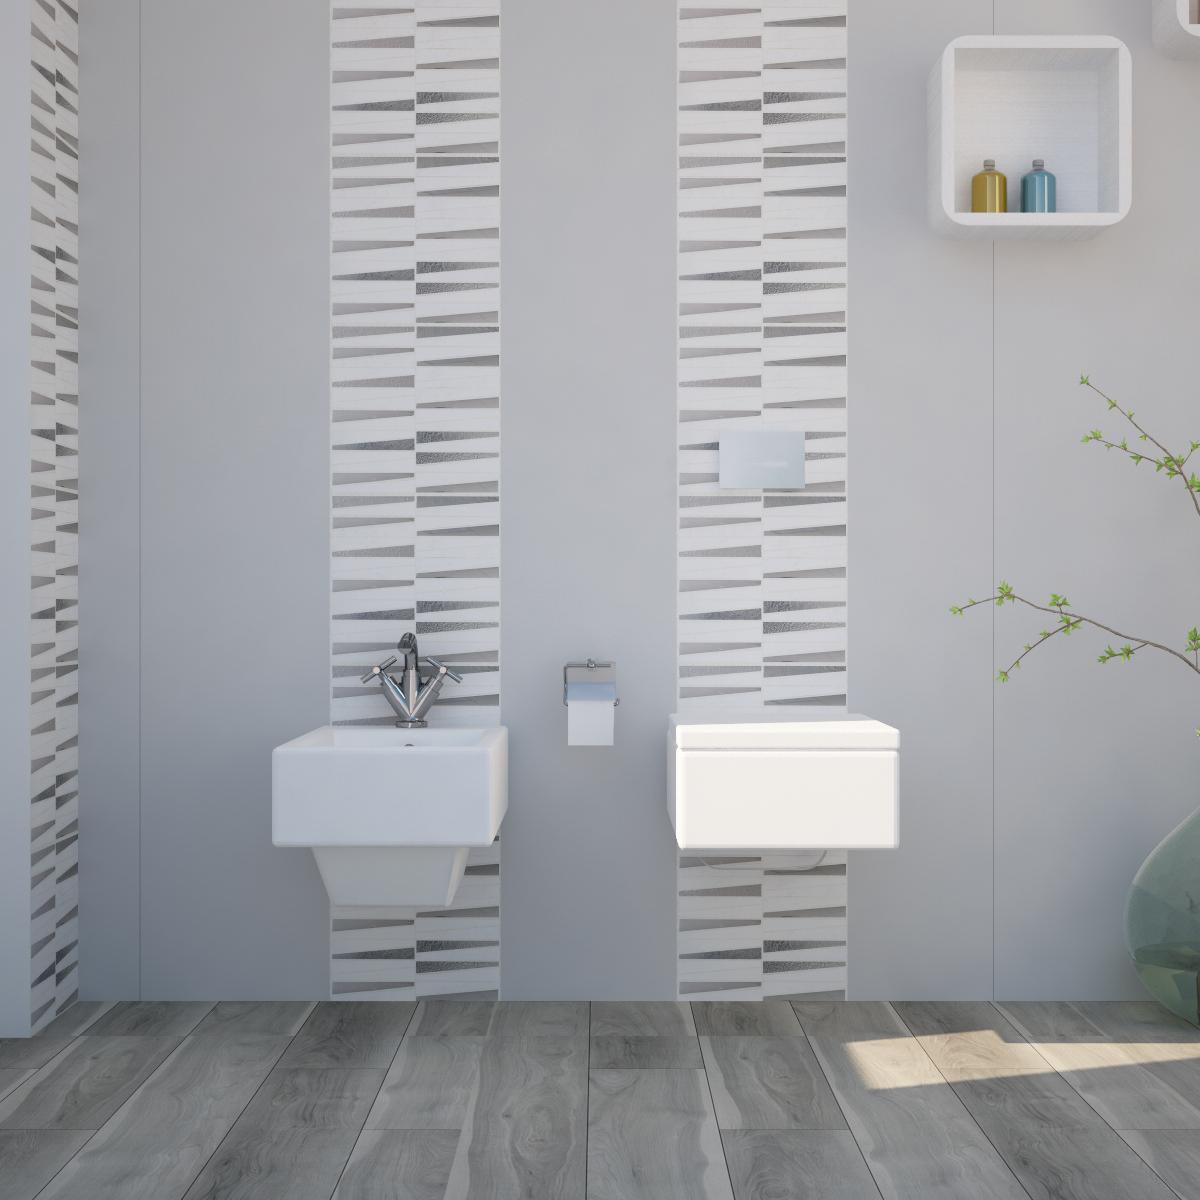 Mosaico H 30 x L 30 cm bianco - 1